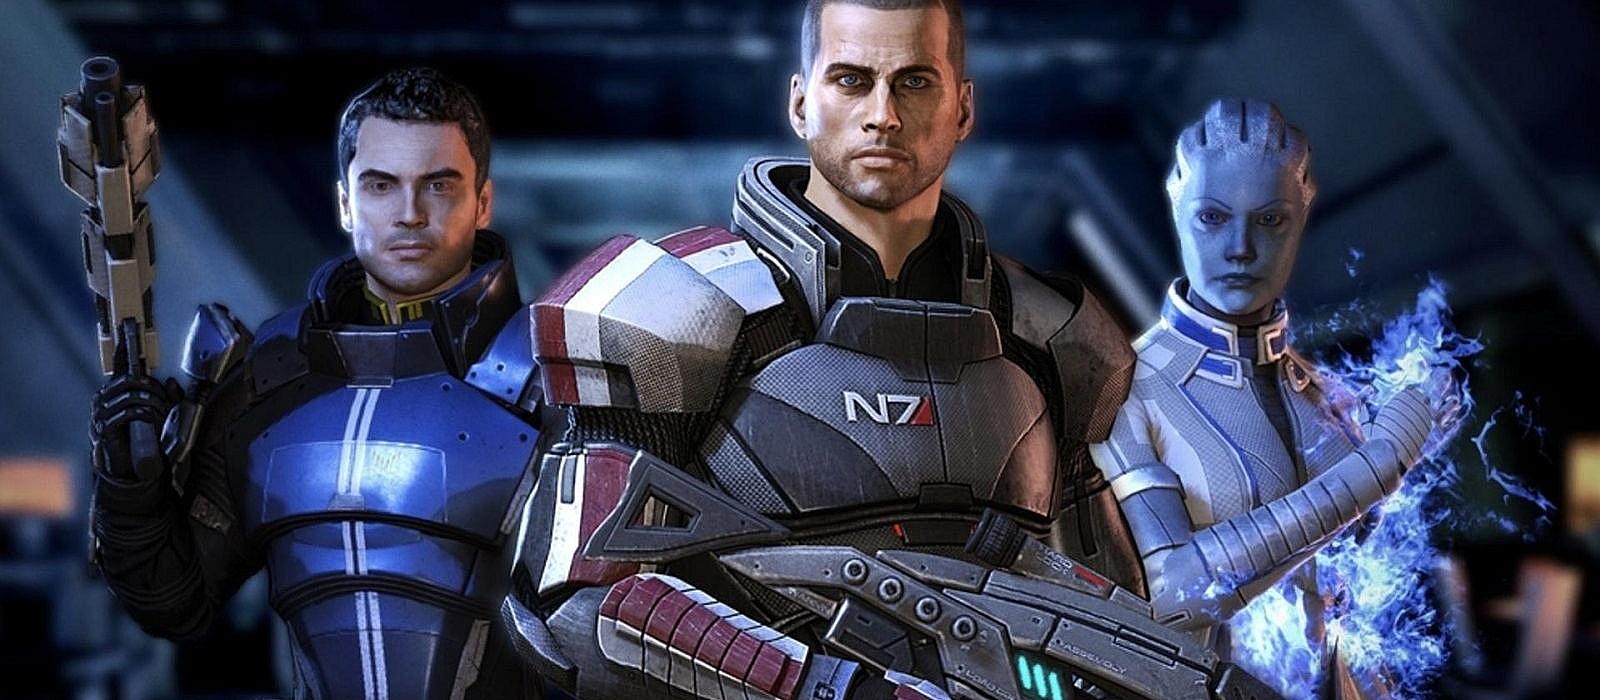 Mass Effect Legendary Edition Review, Neuer STALKER 2 Screenshot & Hot Cosplay - Neuer SpielGesetz Podcast veröffentlicht